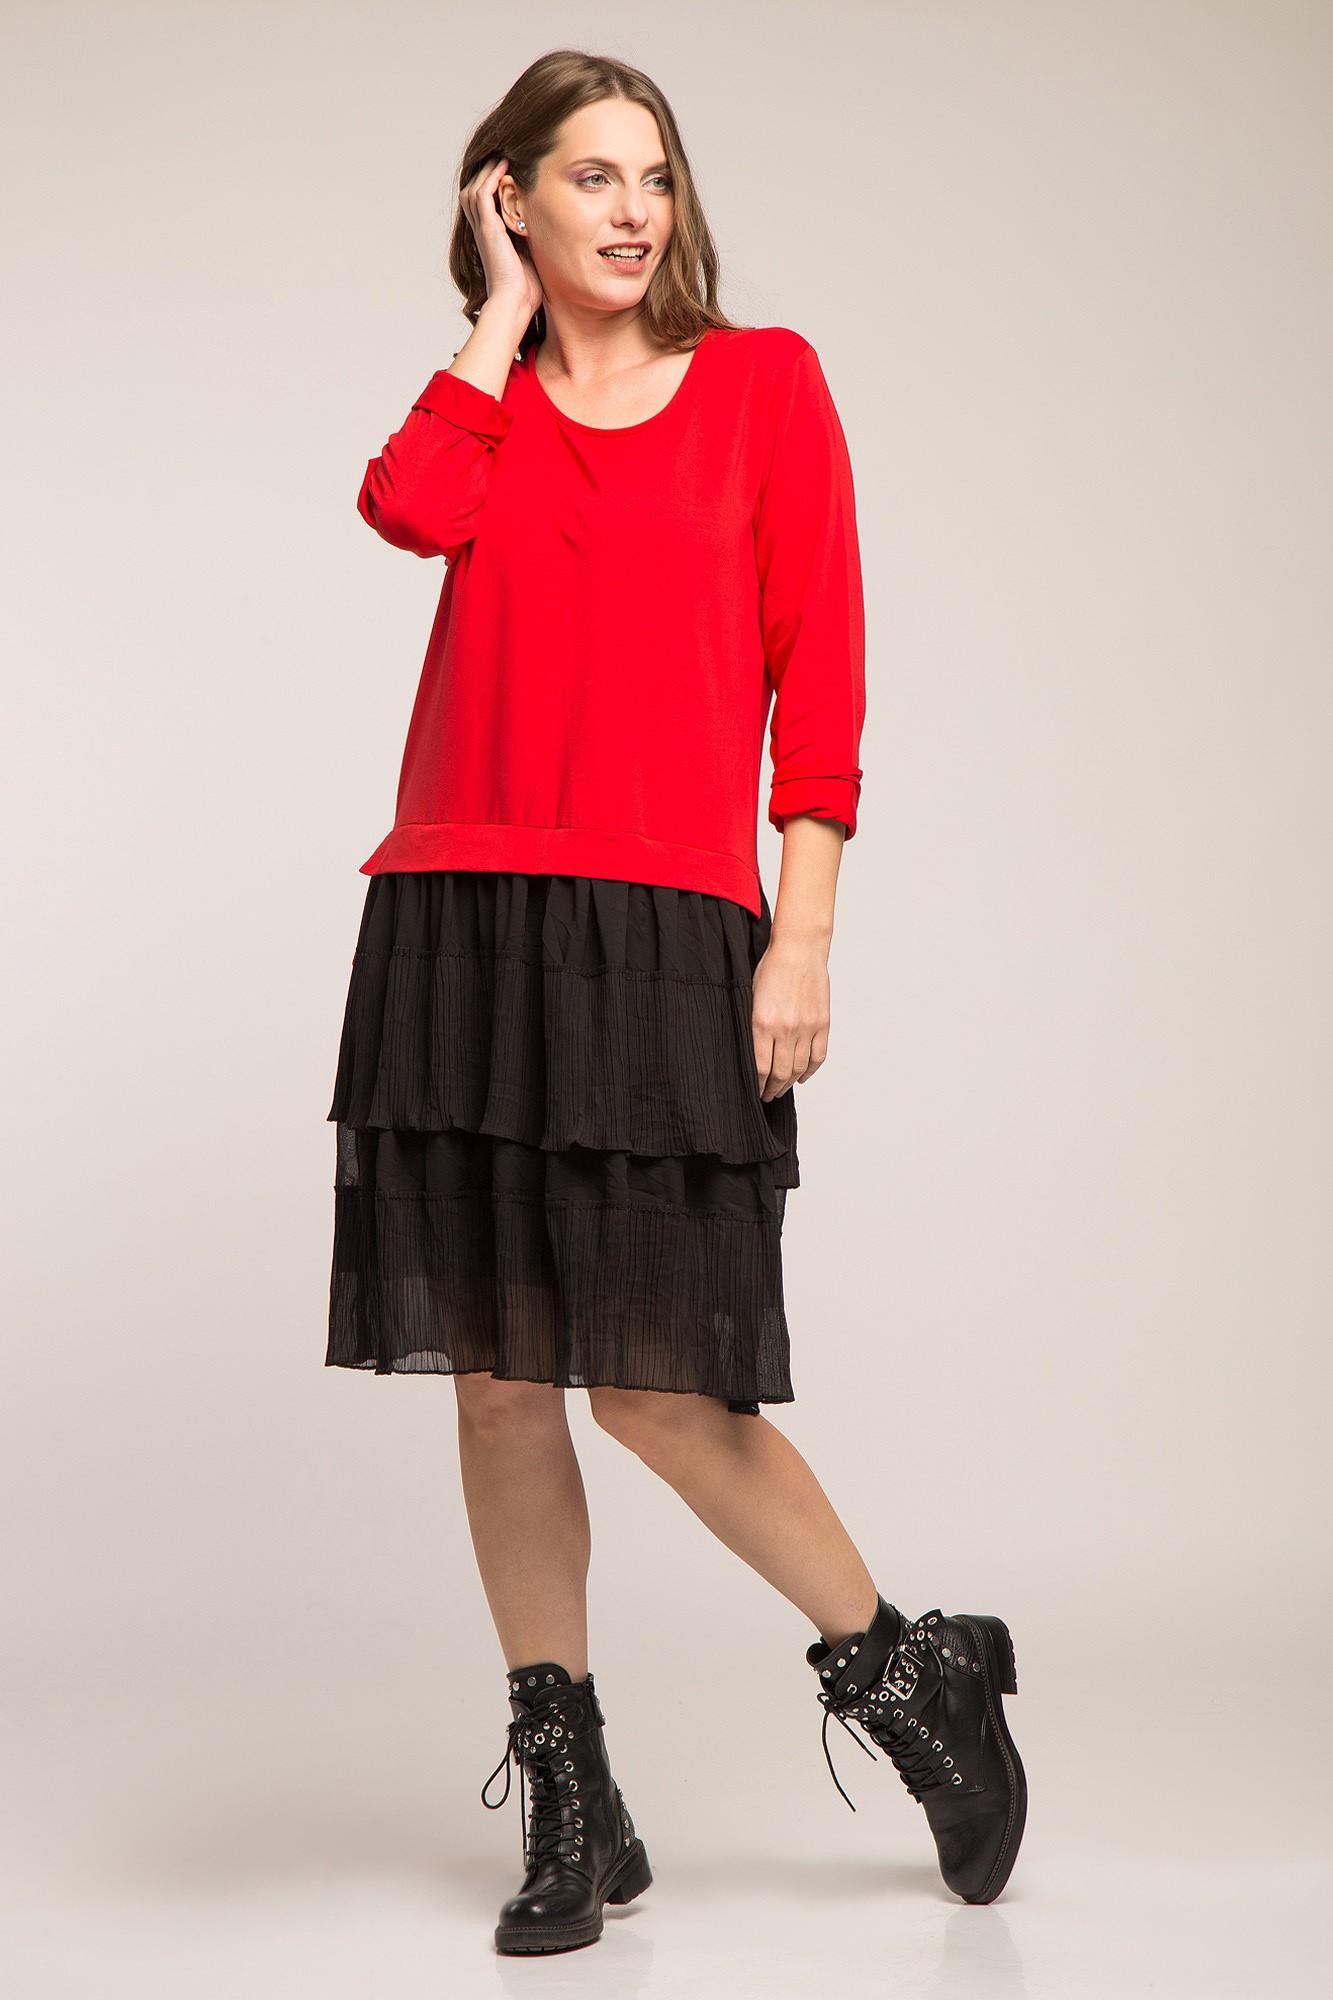 Rochie hanorac bumbac gros rosu si volane negre creponate